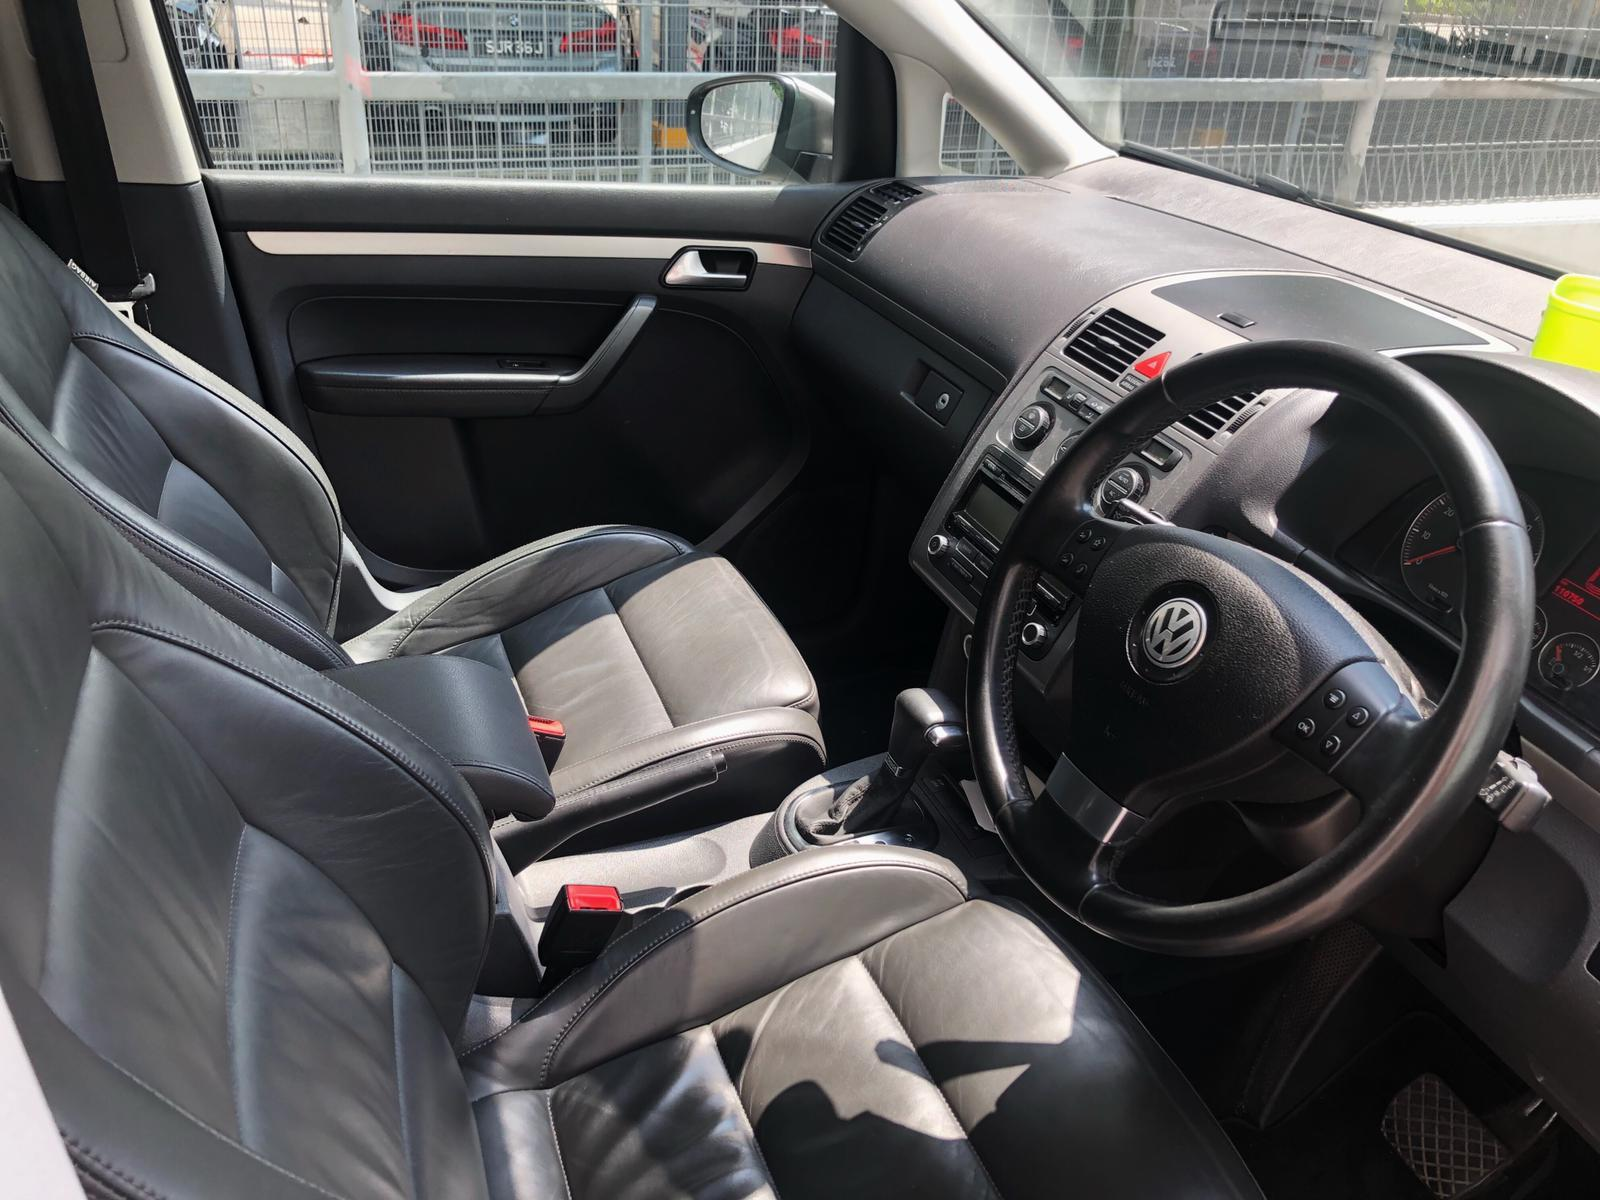 Volkswagen Touran MPV Toyota Vios Wish Altis Car Axio Premio Allion Camry Estima Honda Jazz Fit Stream Civic Cars Hyundai Avante Mazda 3 2 For Rent Grab Rental Gojek Or Personal Use Low price and Cheap